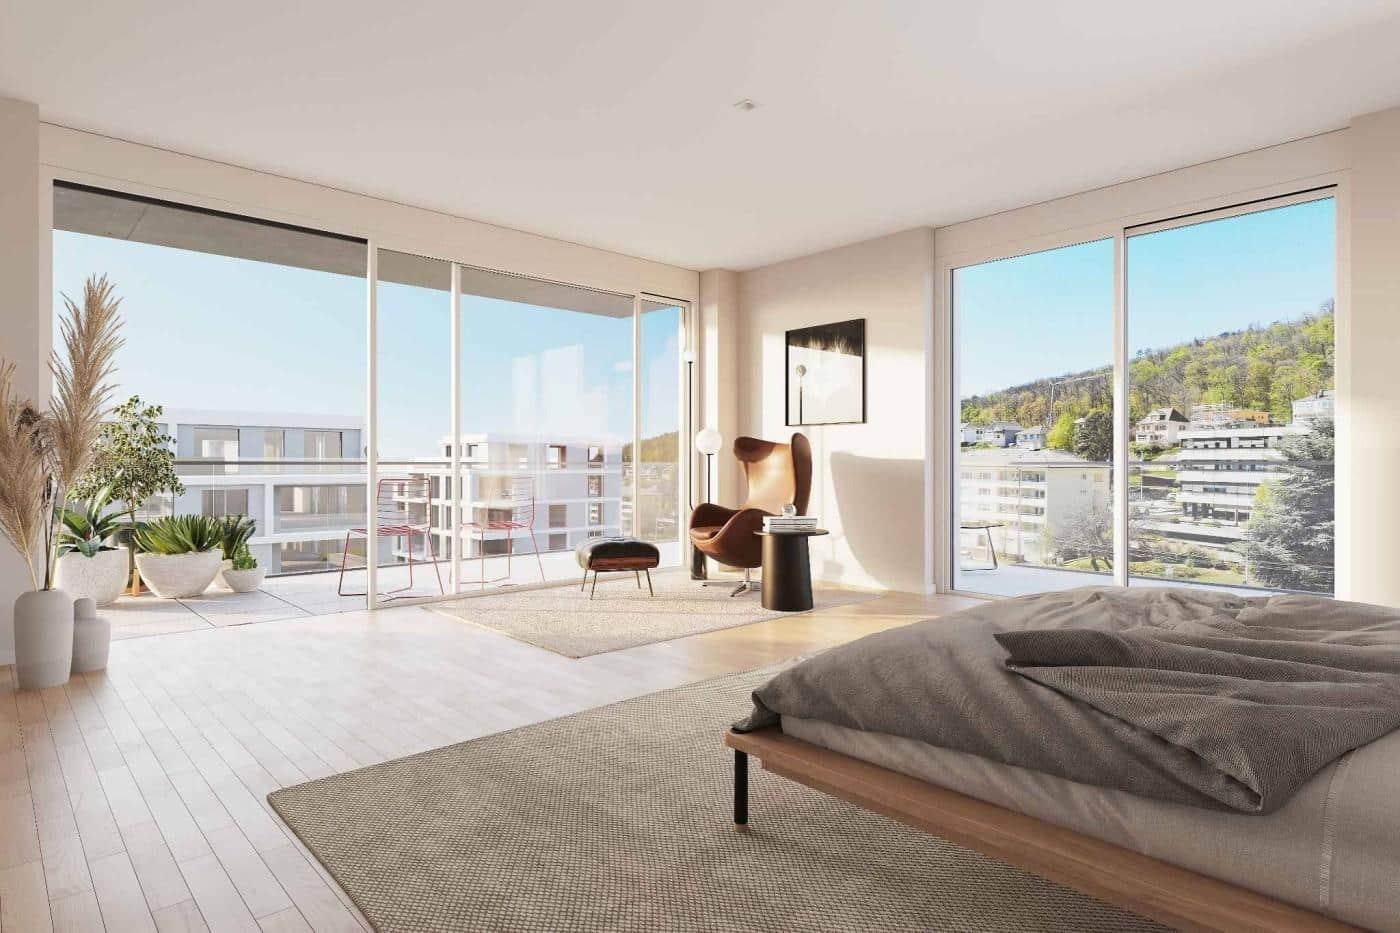 À vendre : Appartement 2 chambres Neuchâtel - Ref : 34707 | Naef Immobilier